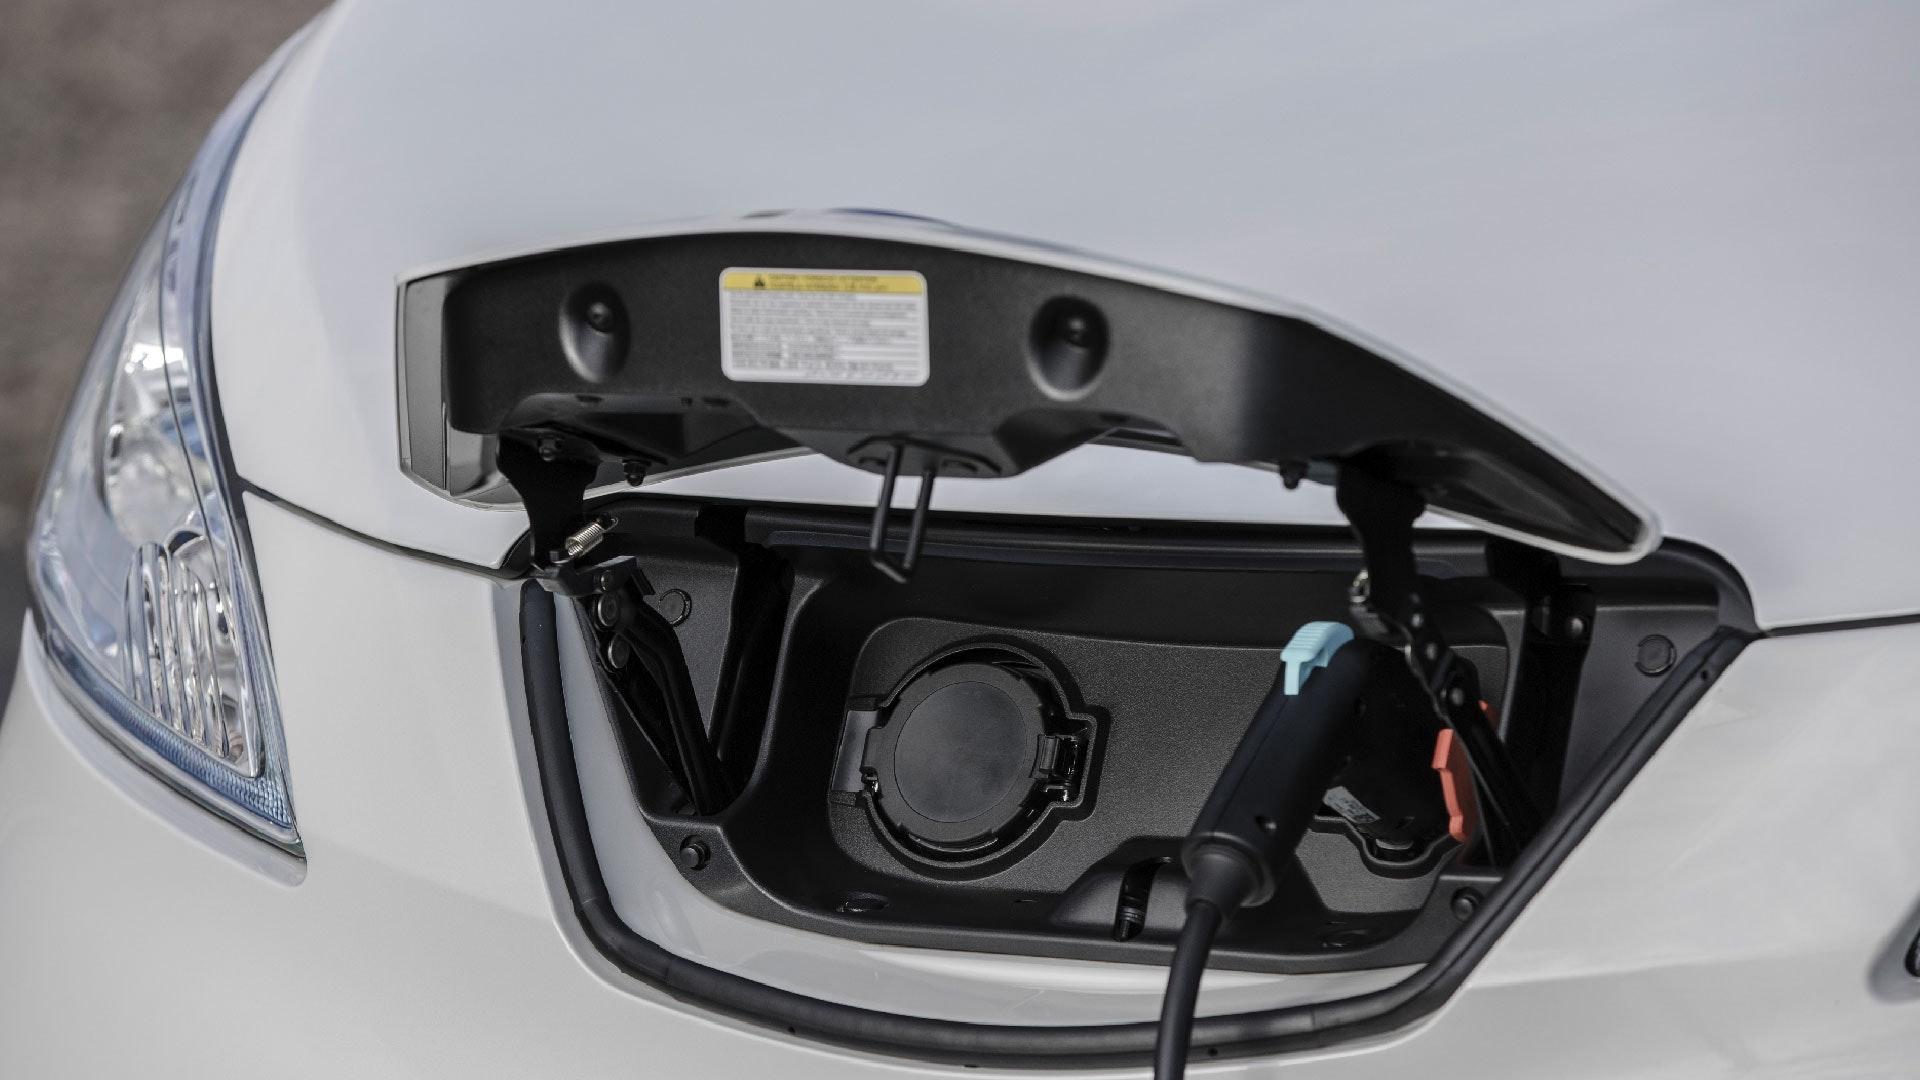 Nissan e-NV200 Evalia lader